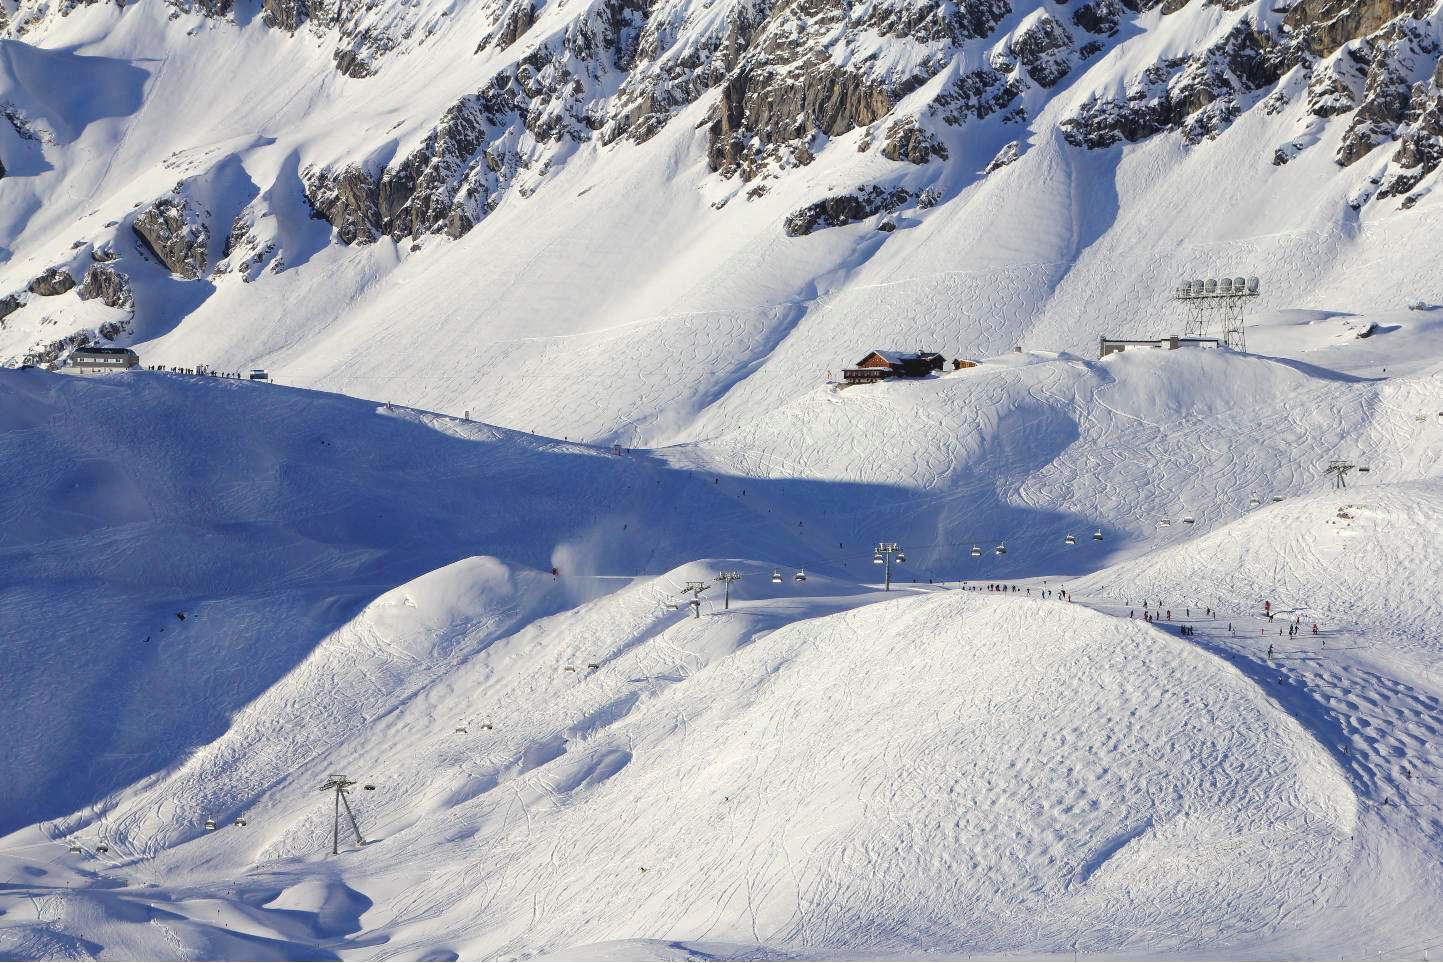 St Anton afternoon slopes © JonoVernon-Powell